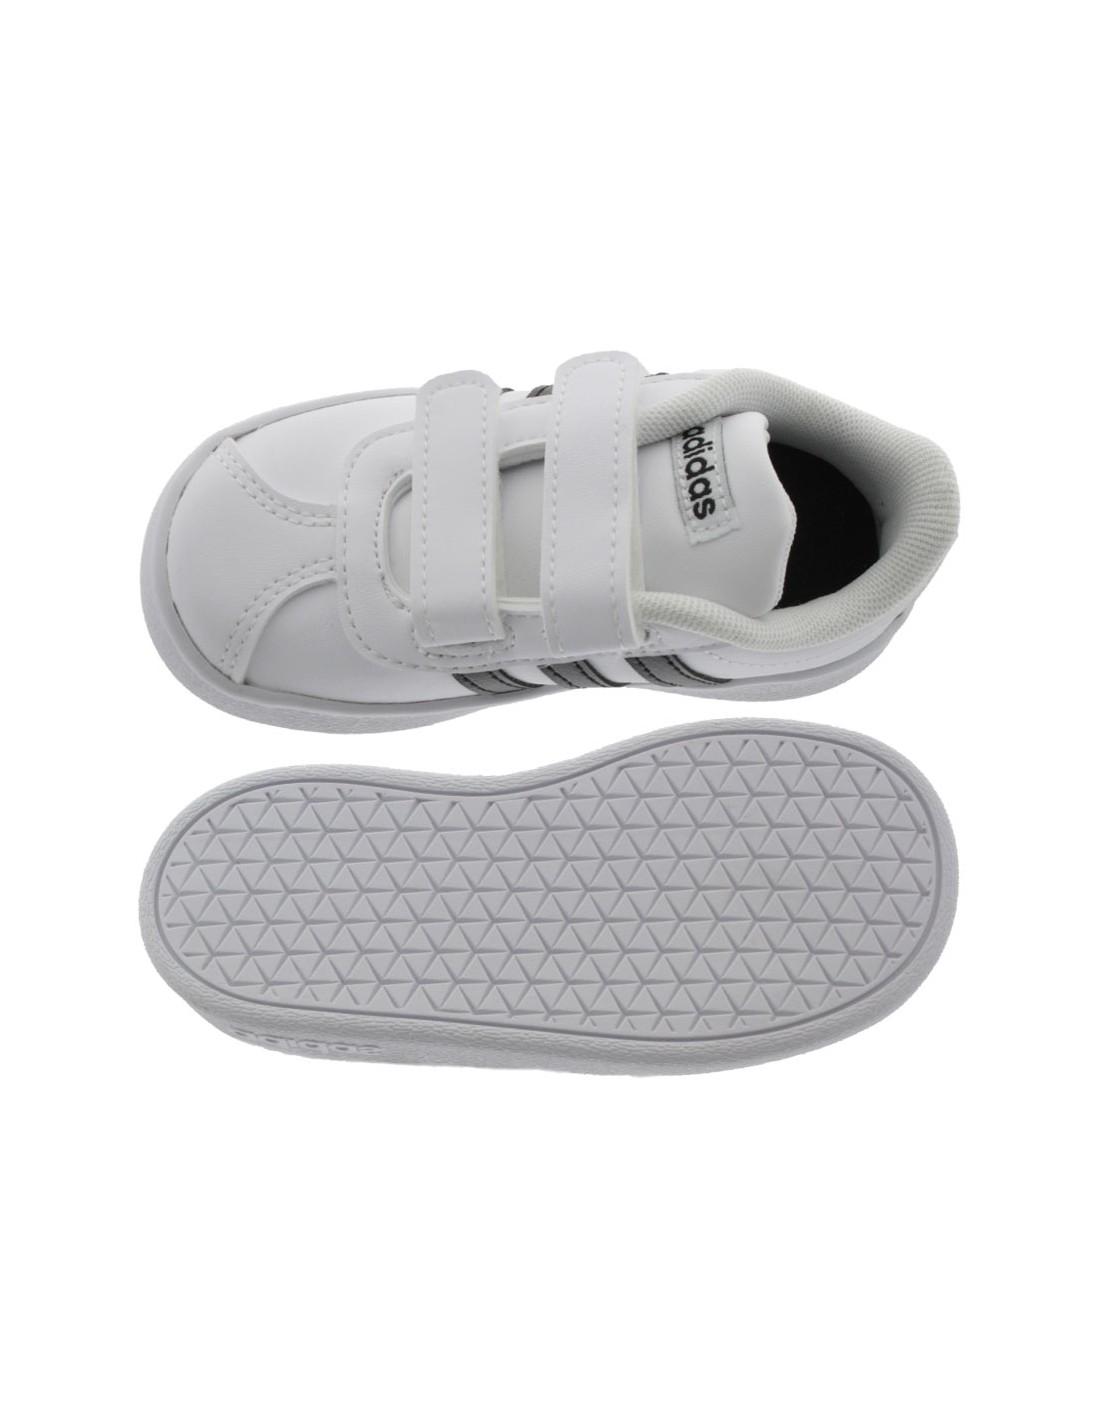 more photos 70fb5 1f446 Scarpe Adidas Vl Court 2.0 bambino primi passi bianco